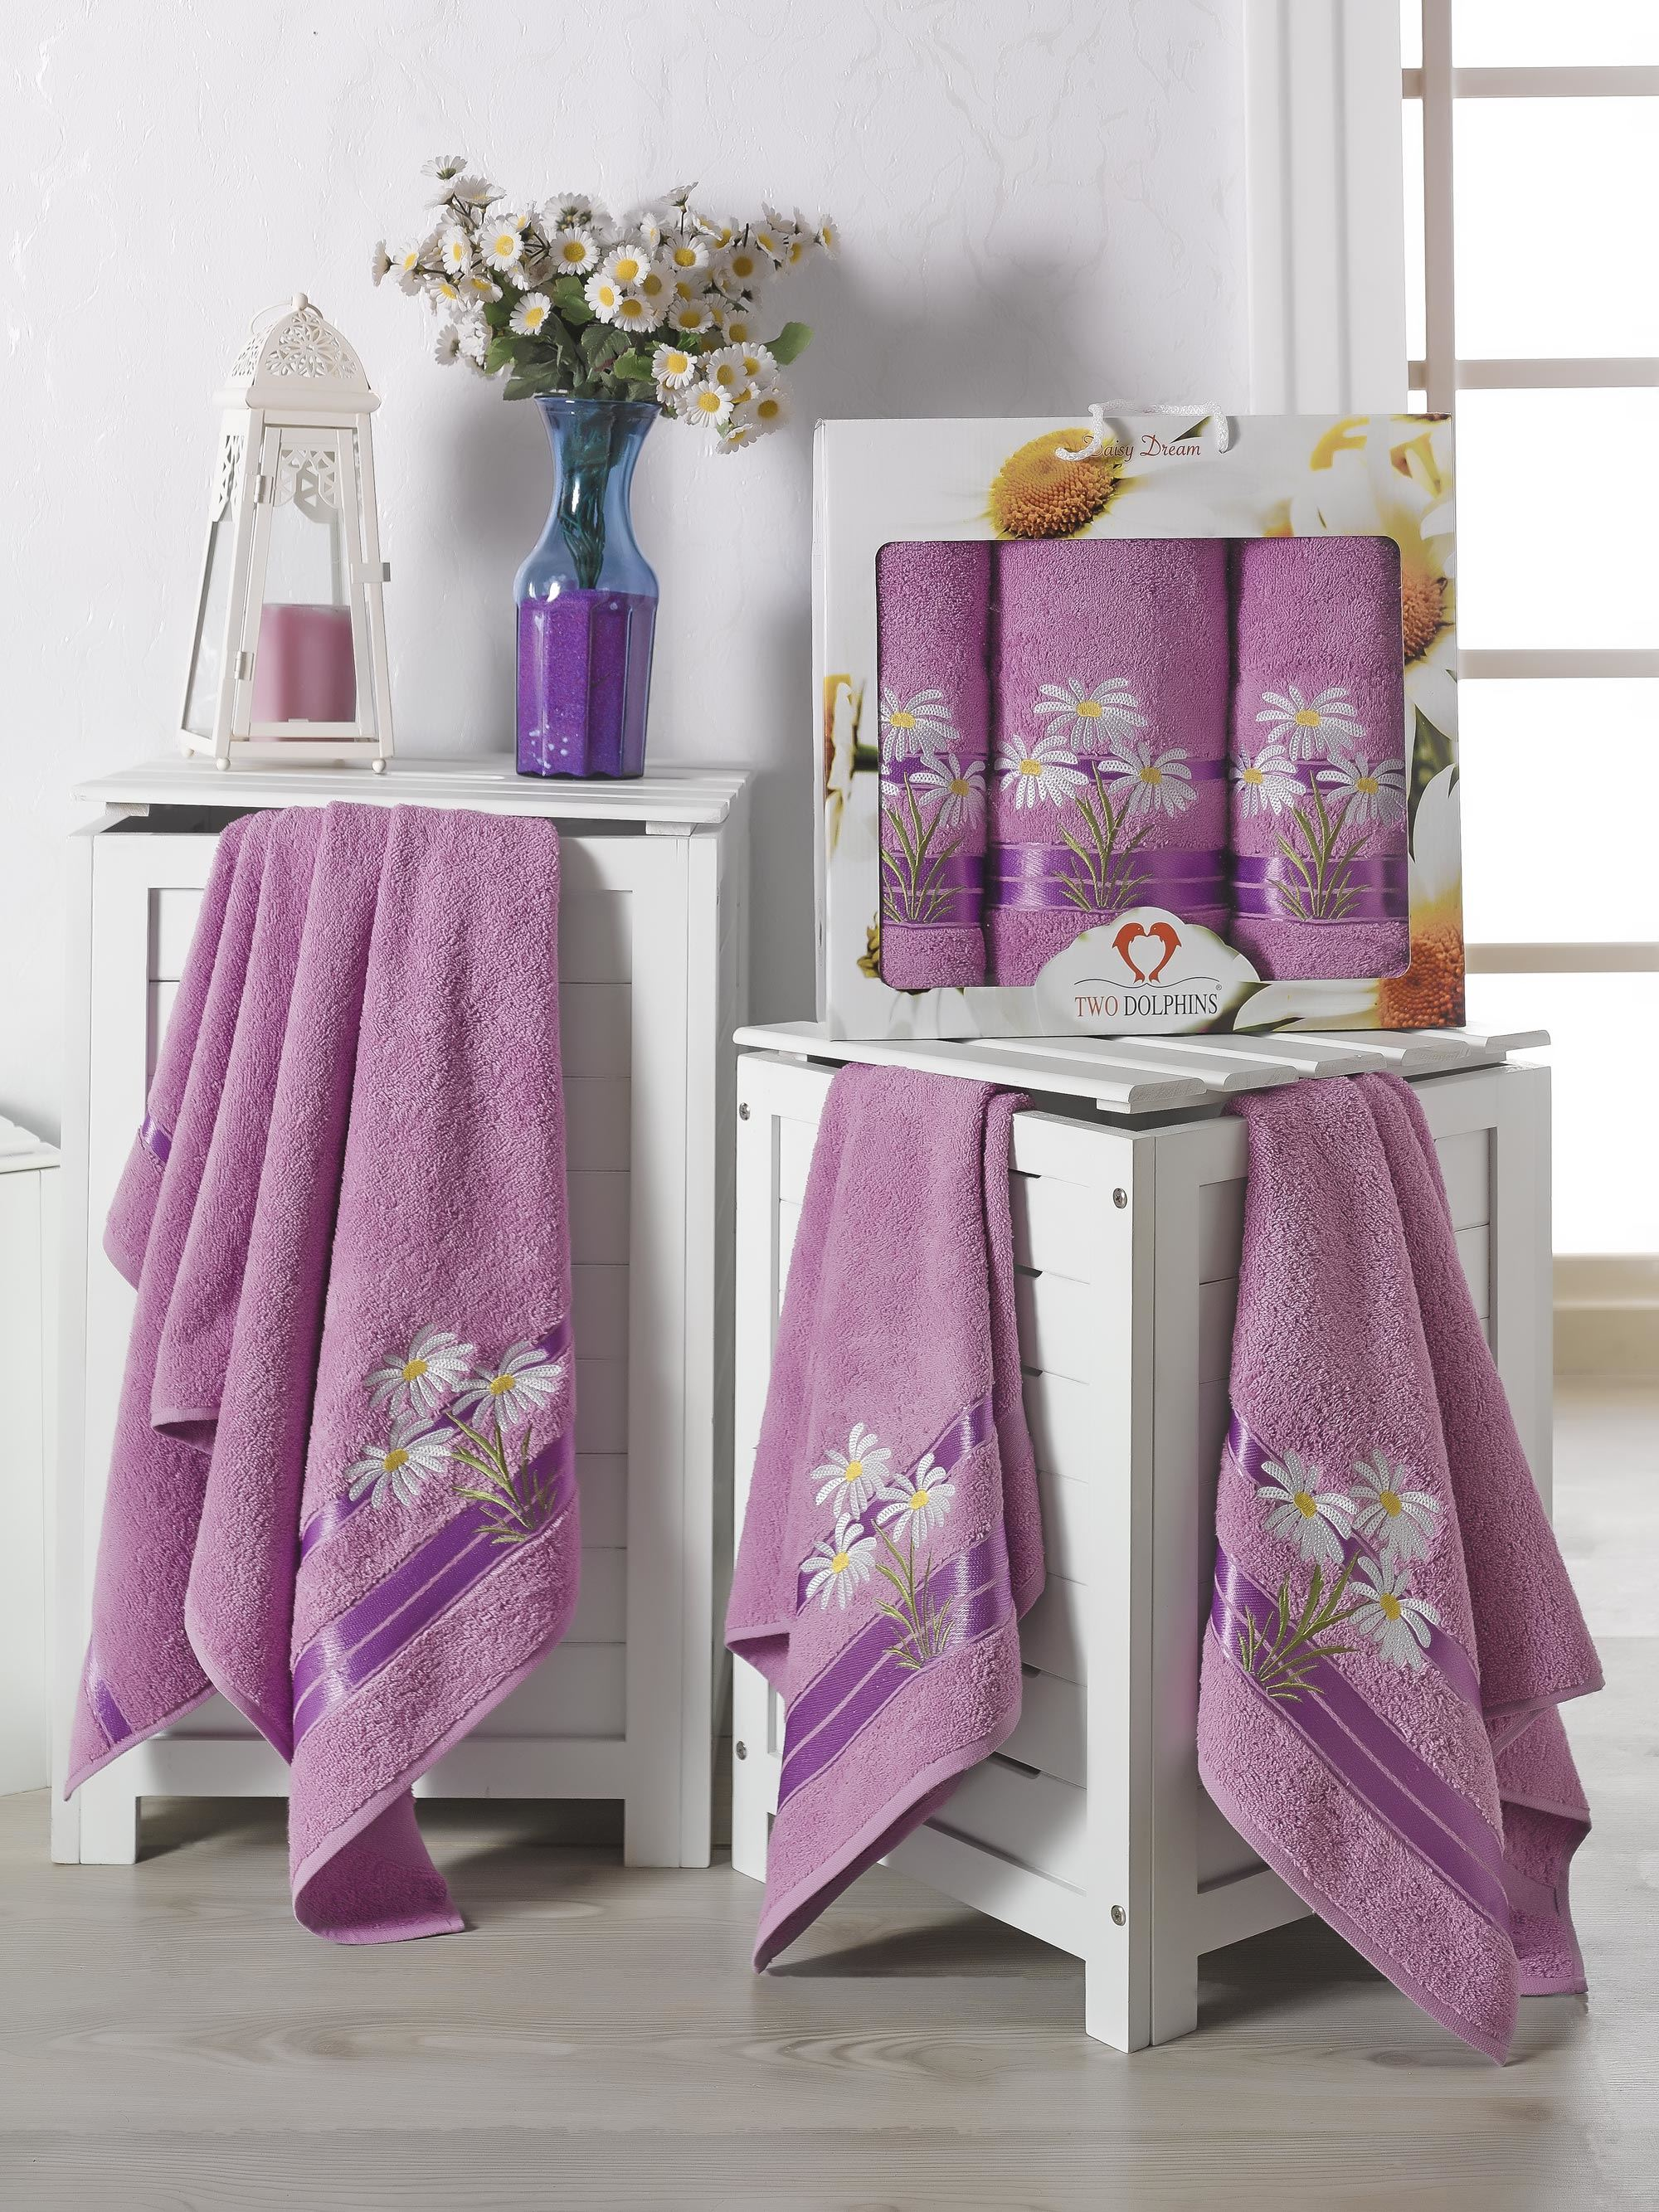 Купить Полотенца Two Dolphins, Полотенце Daisy Dream Цвет: Лиловый (50х90 см - 2 шт, 70х140 см), Турция, Сиреневый, Махра